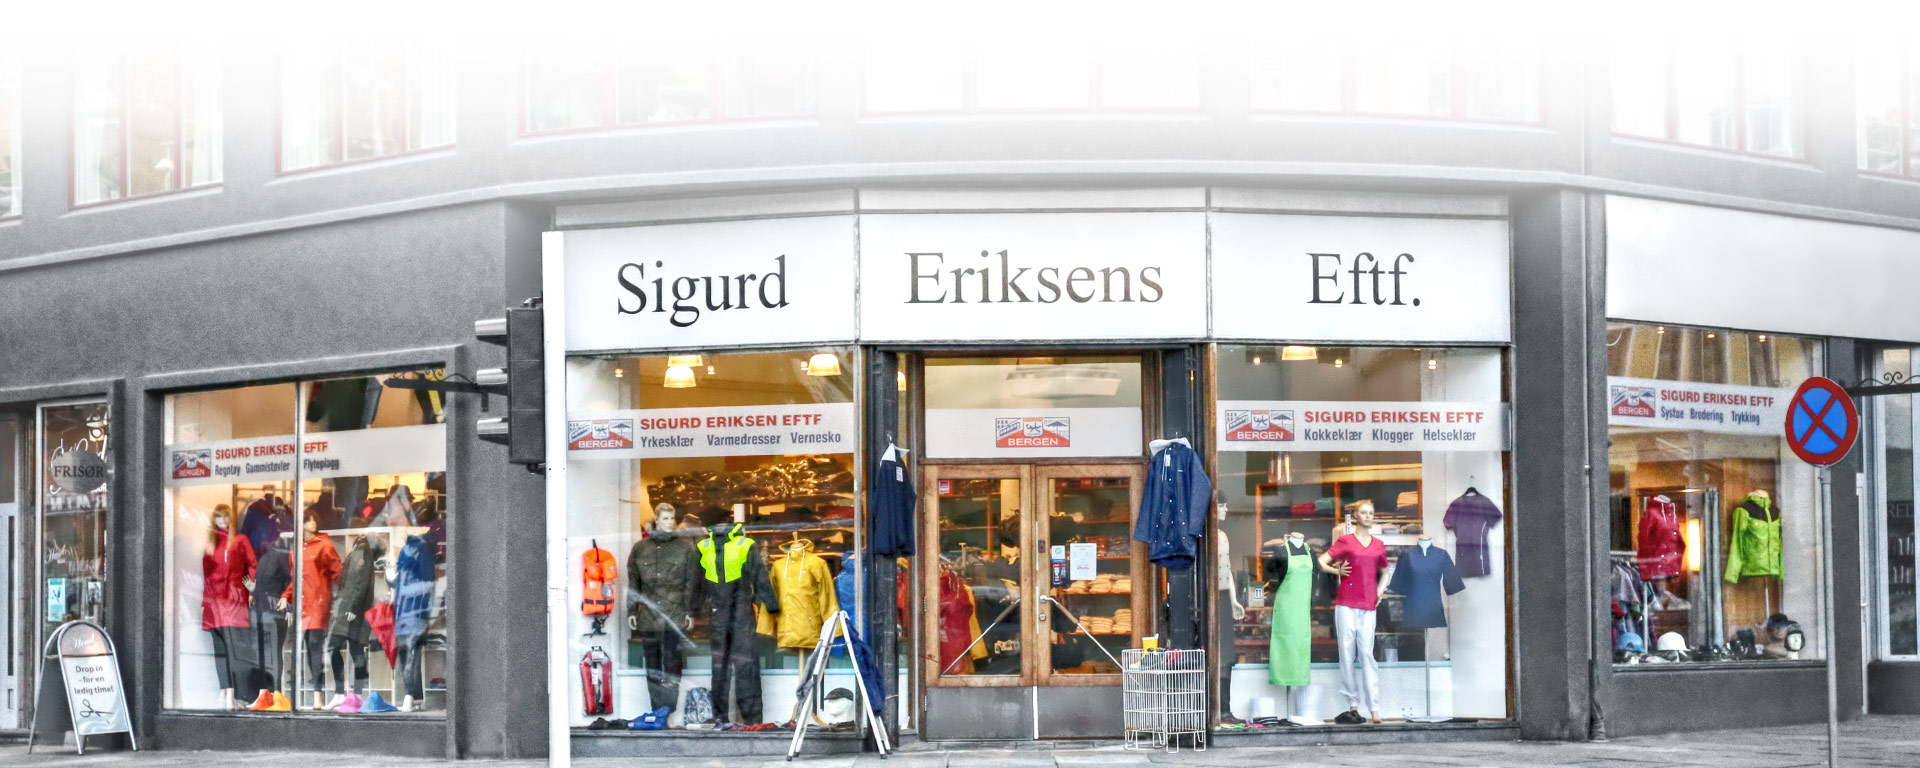 10651be3a Eriksens Sigurd Eftf i Bergen – Yrkesklær – Kokkeklær – Servitørklær ...